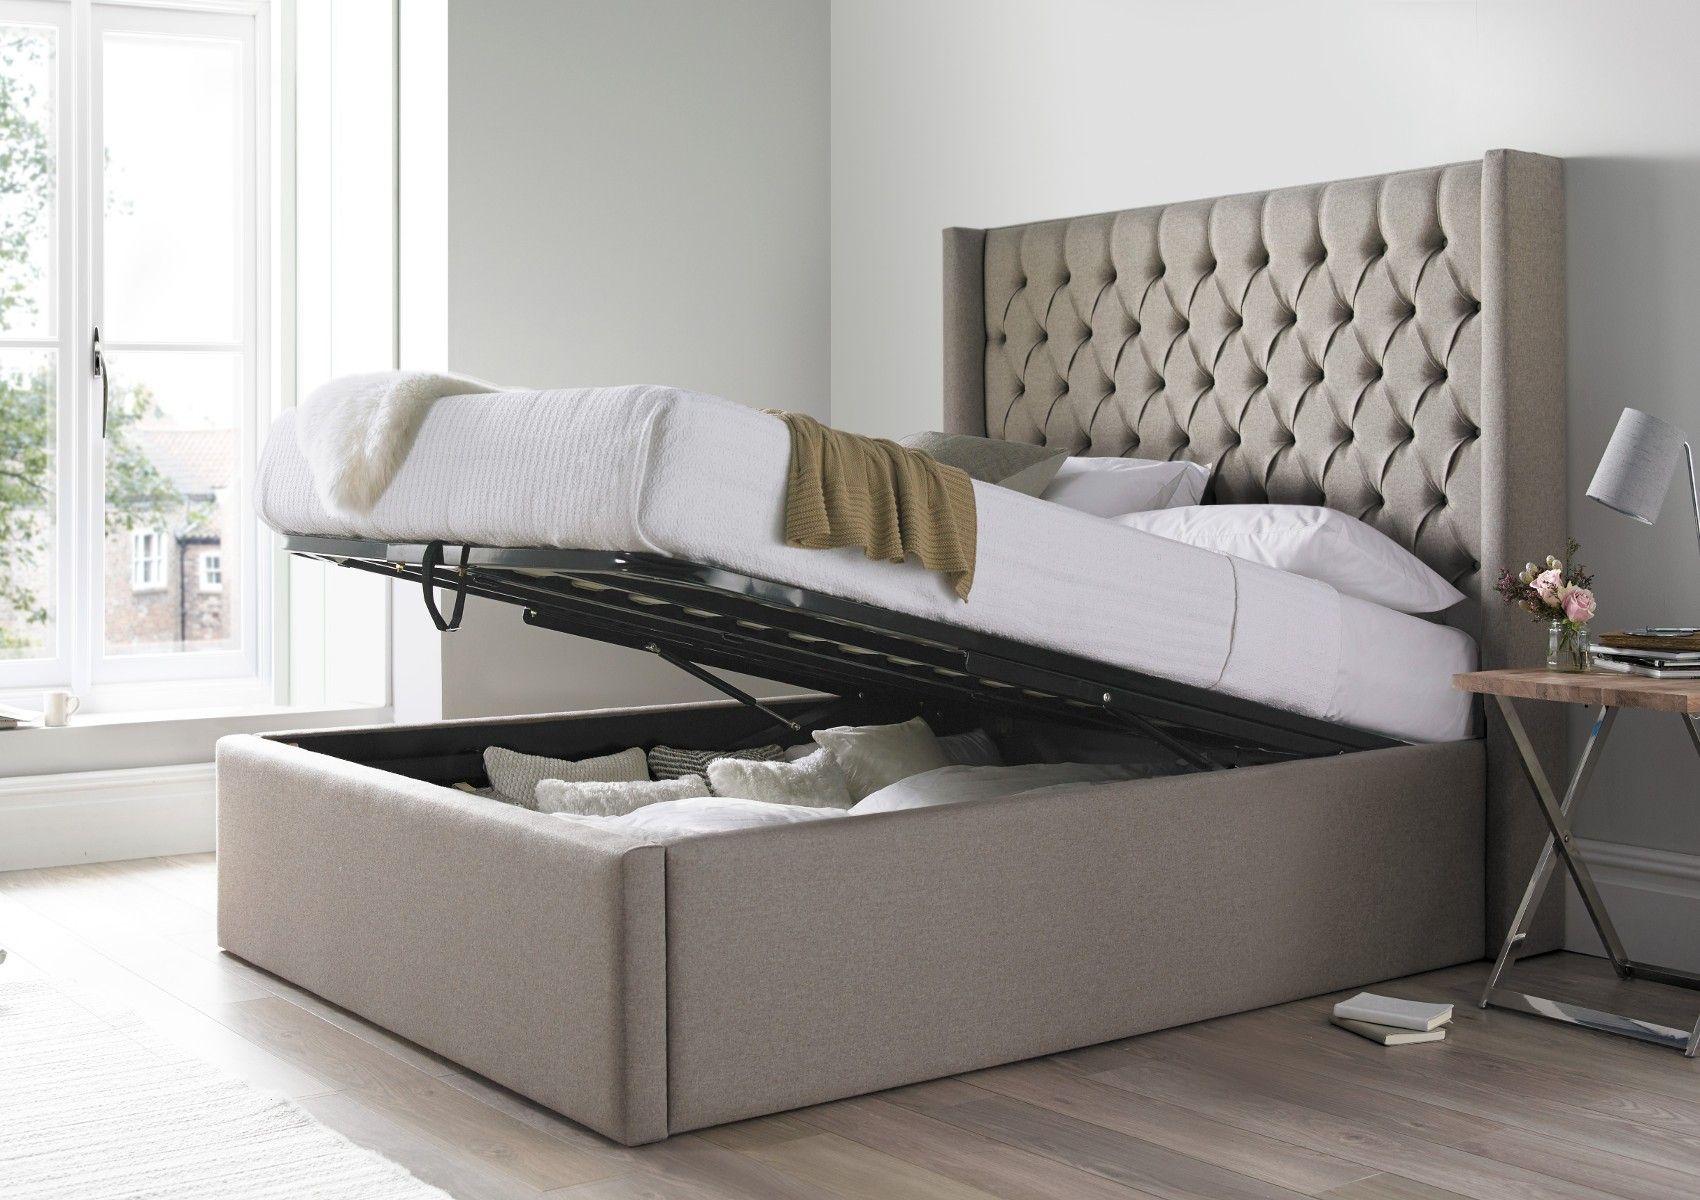 Islington Shetland Mercury Upholstered Ottoman Double Bed Frame Only ...